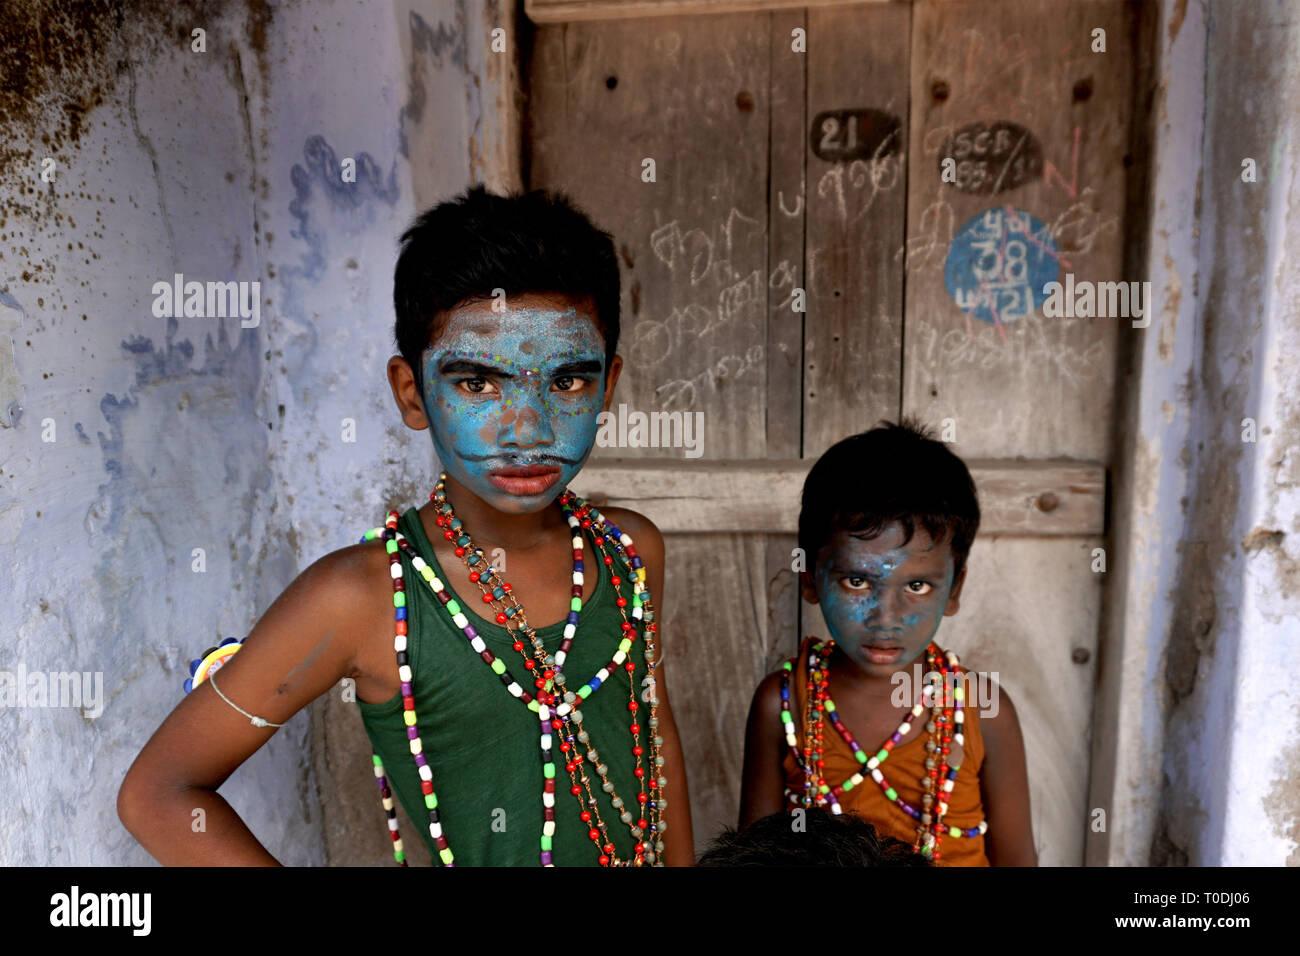 children dress as Hindu Gods near Mutharamman temple, Tamil Nadu, India, Asia - Stock Image